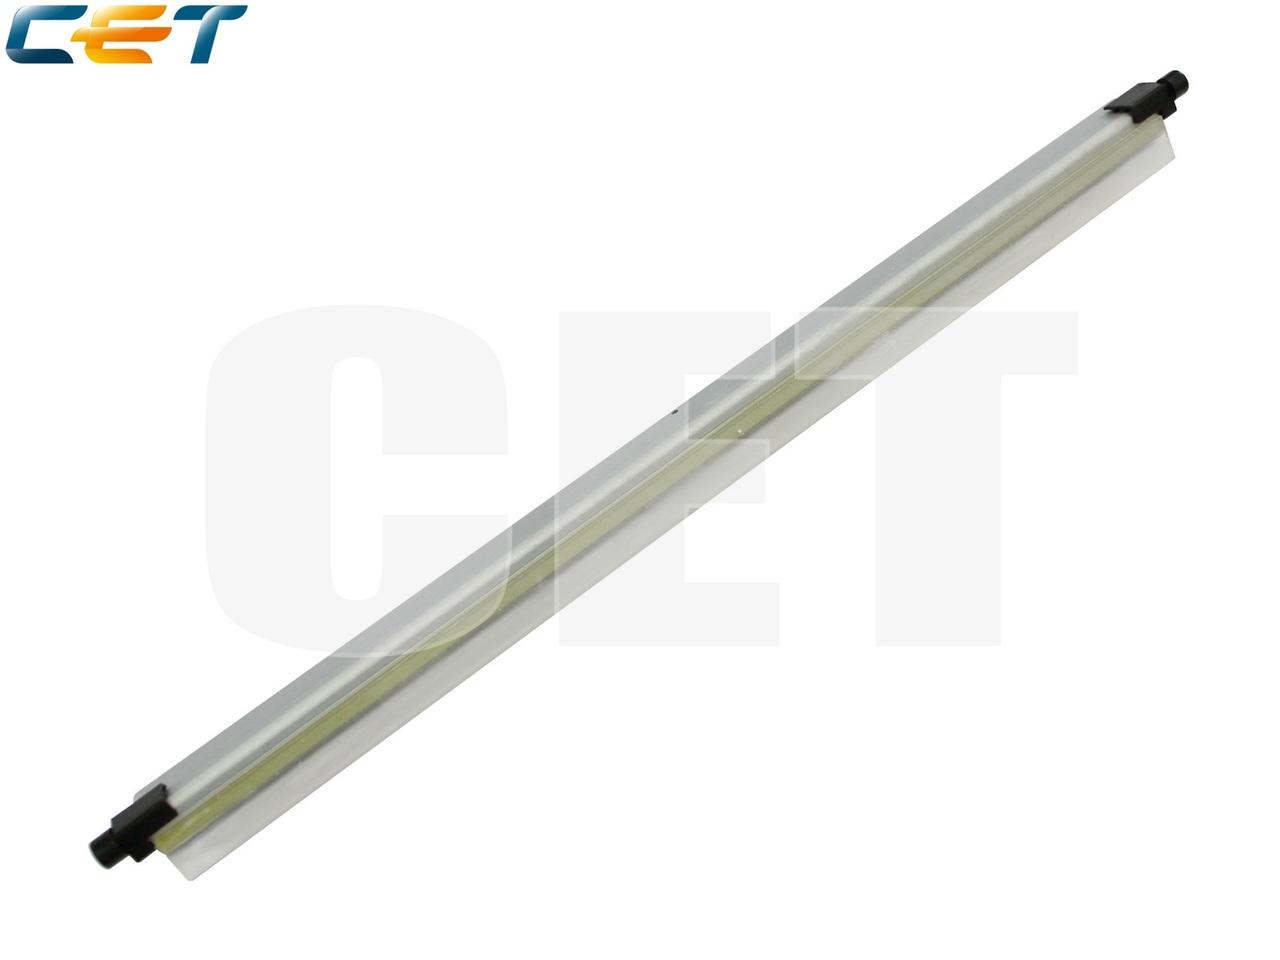 Ракель DZHP007145, PJZYF2754PU для PANASONICDP3510/DP4510 (CET), CET4623